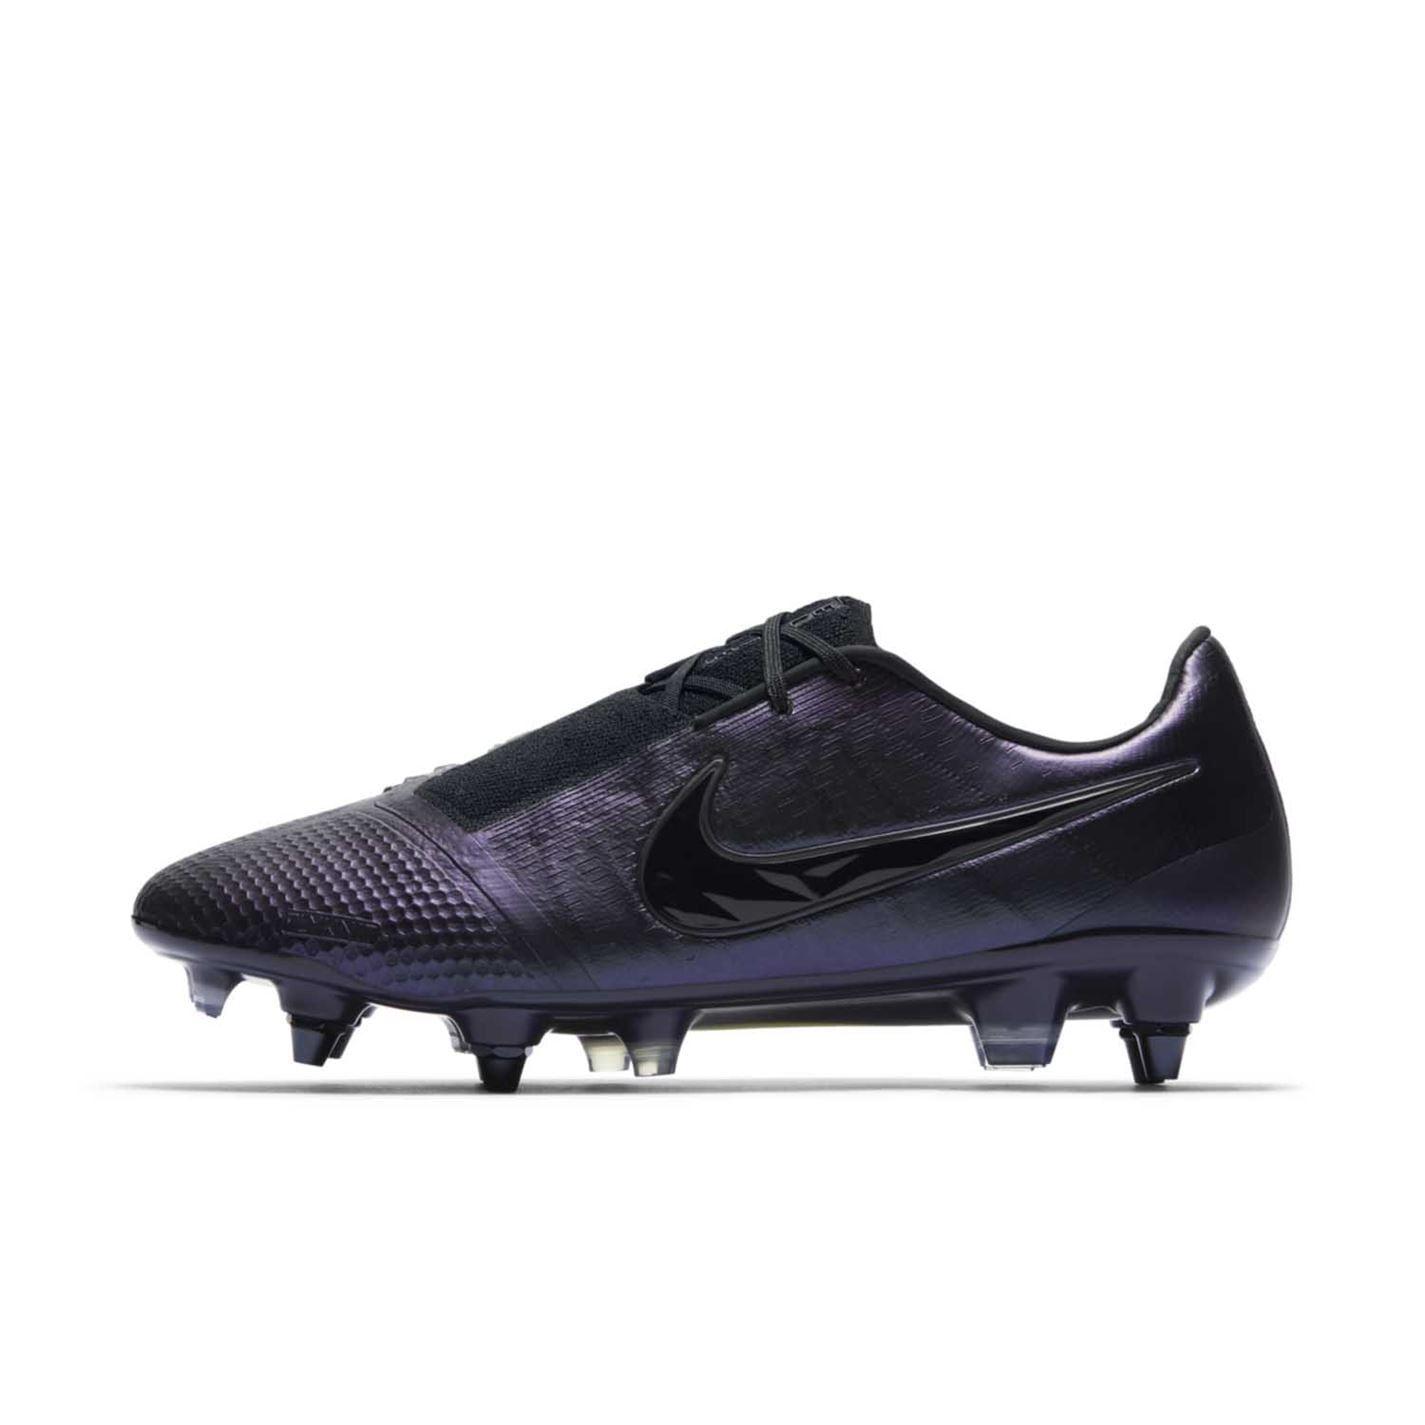 Nike-Phantom-Venom-Elite-Homme-SG-Terrain-Souple-Chaussures-De-Football-Chaussures-de-foot-crampons miniature 9